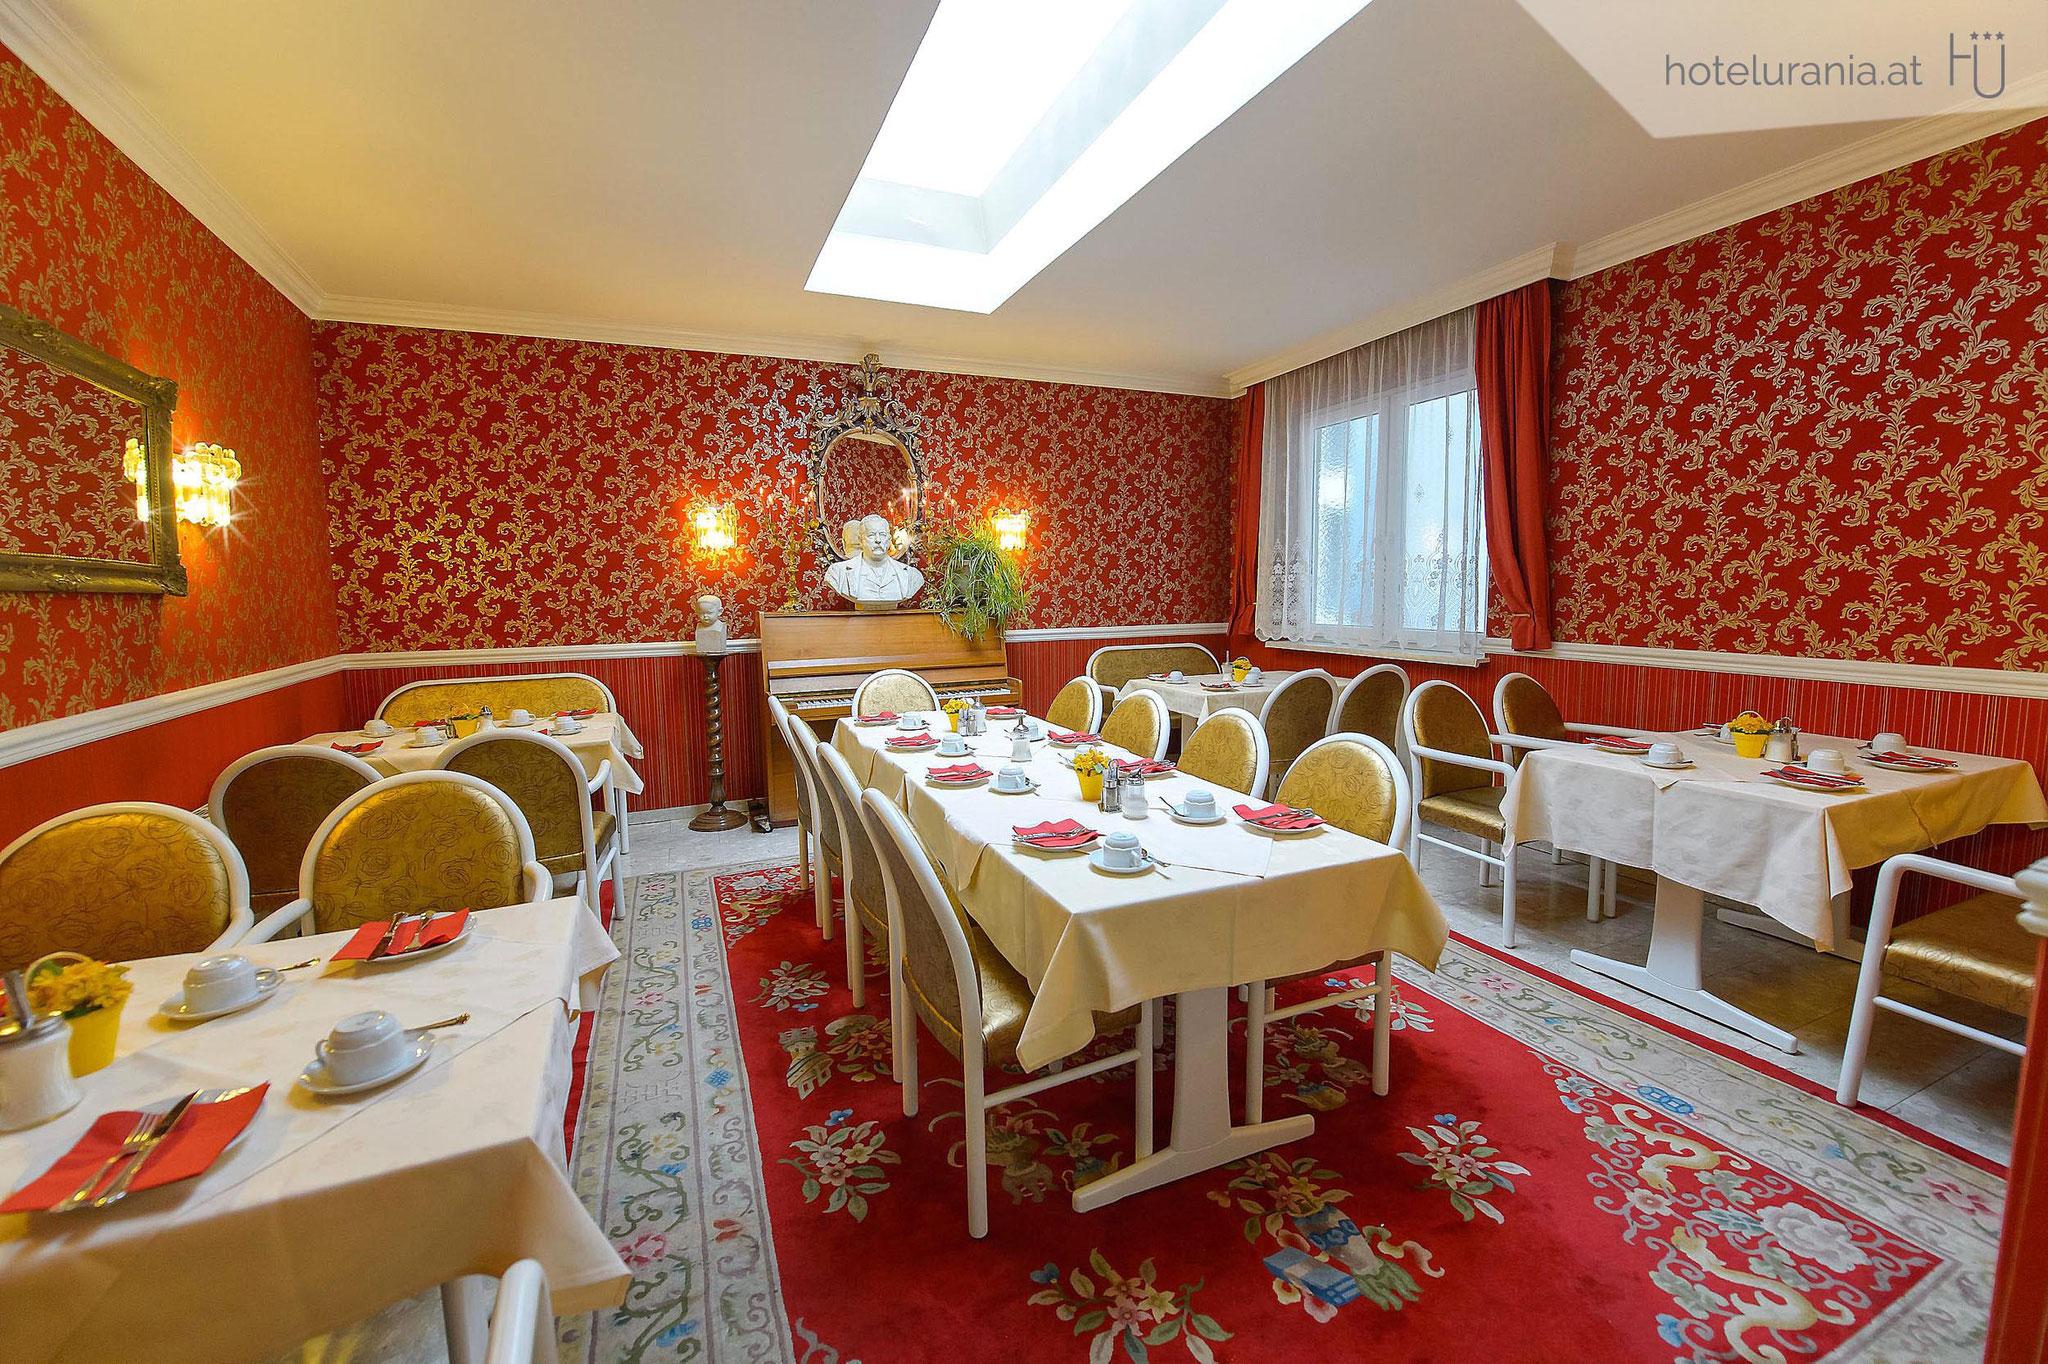 Hotel Urania extensive Viennese breakfast